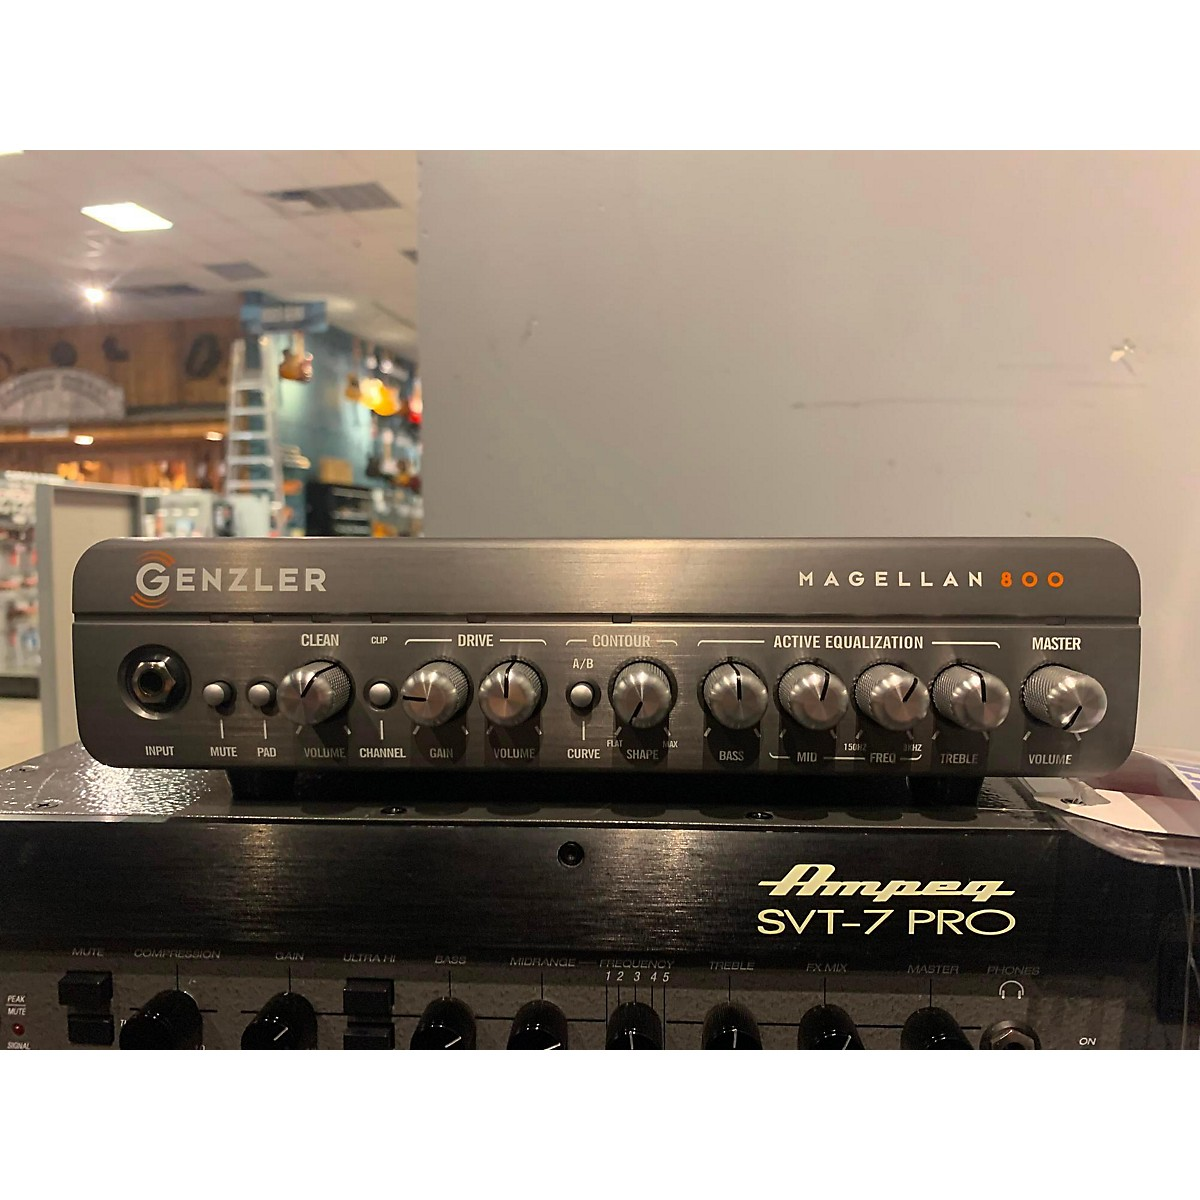 Genzler Amplification MG-800 Magnellan 800 Bass Amp Head